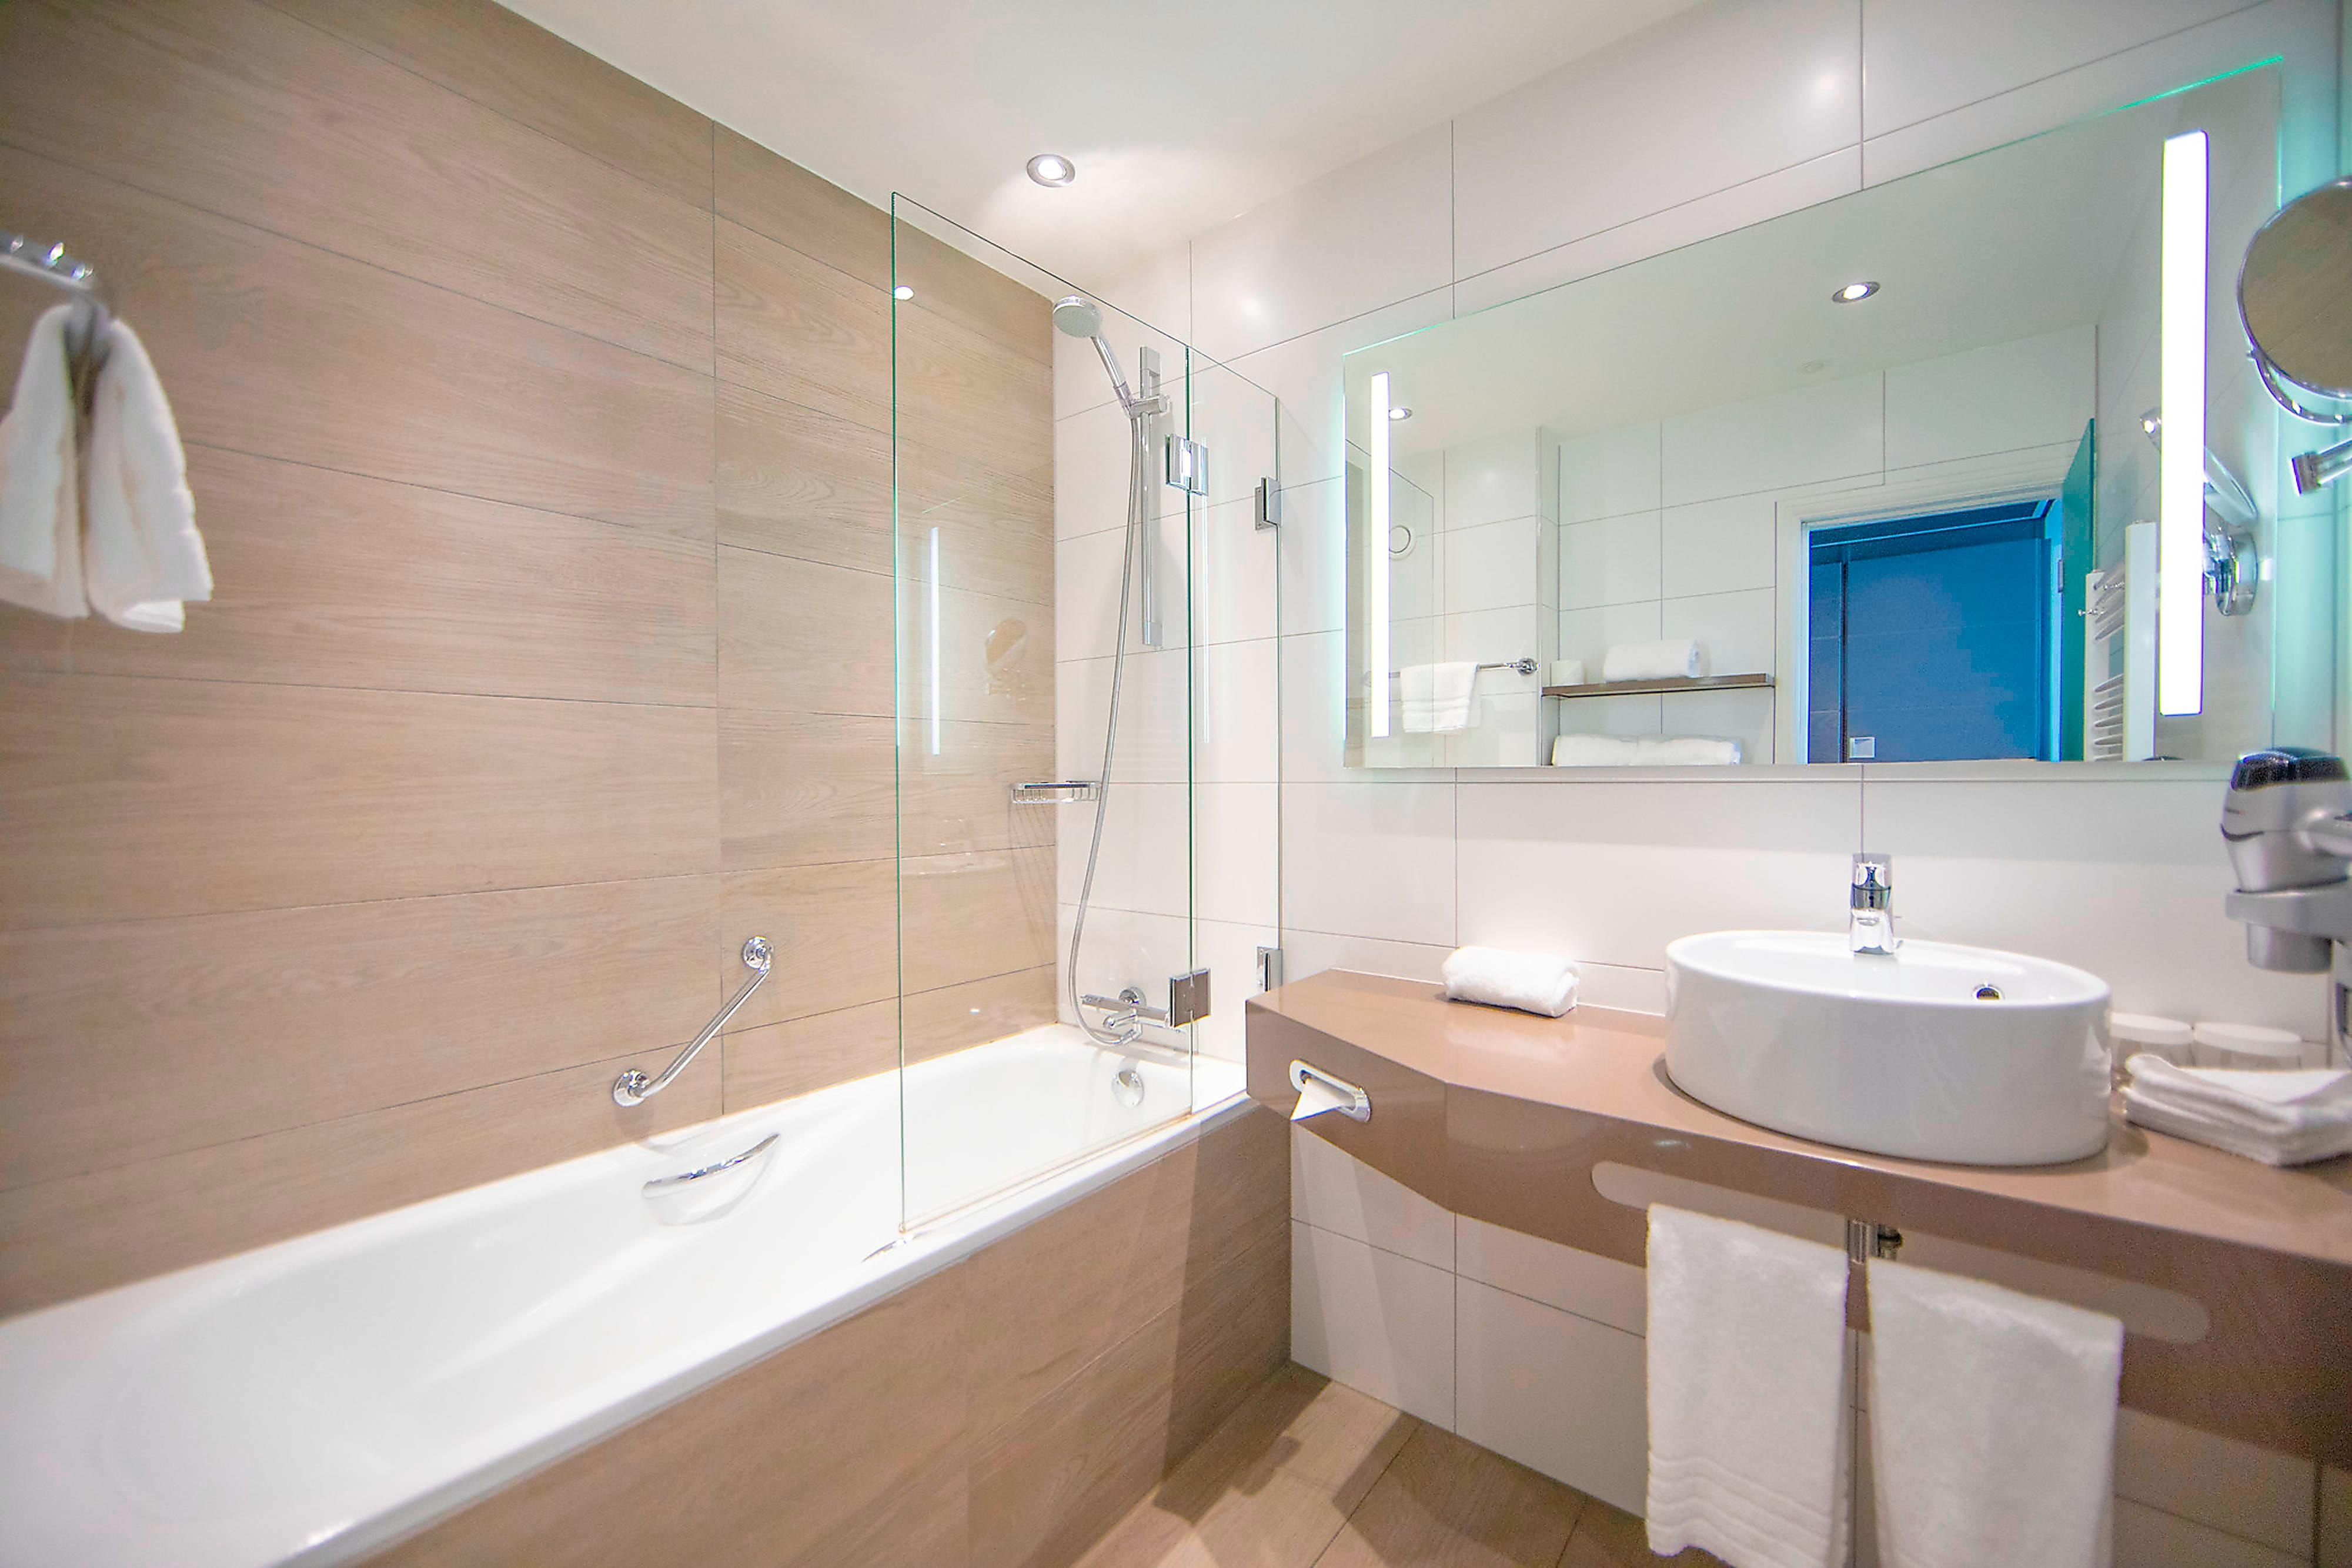 Executive Guest Bathroom - Bathtub